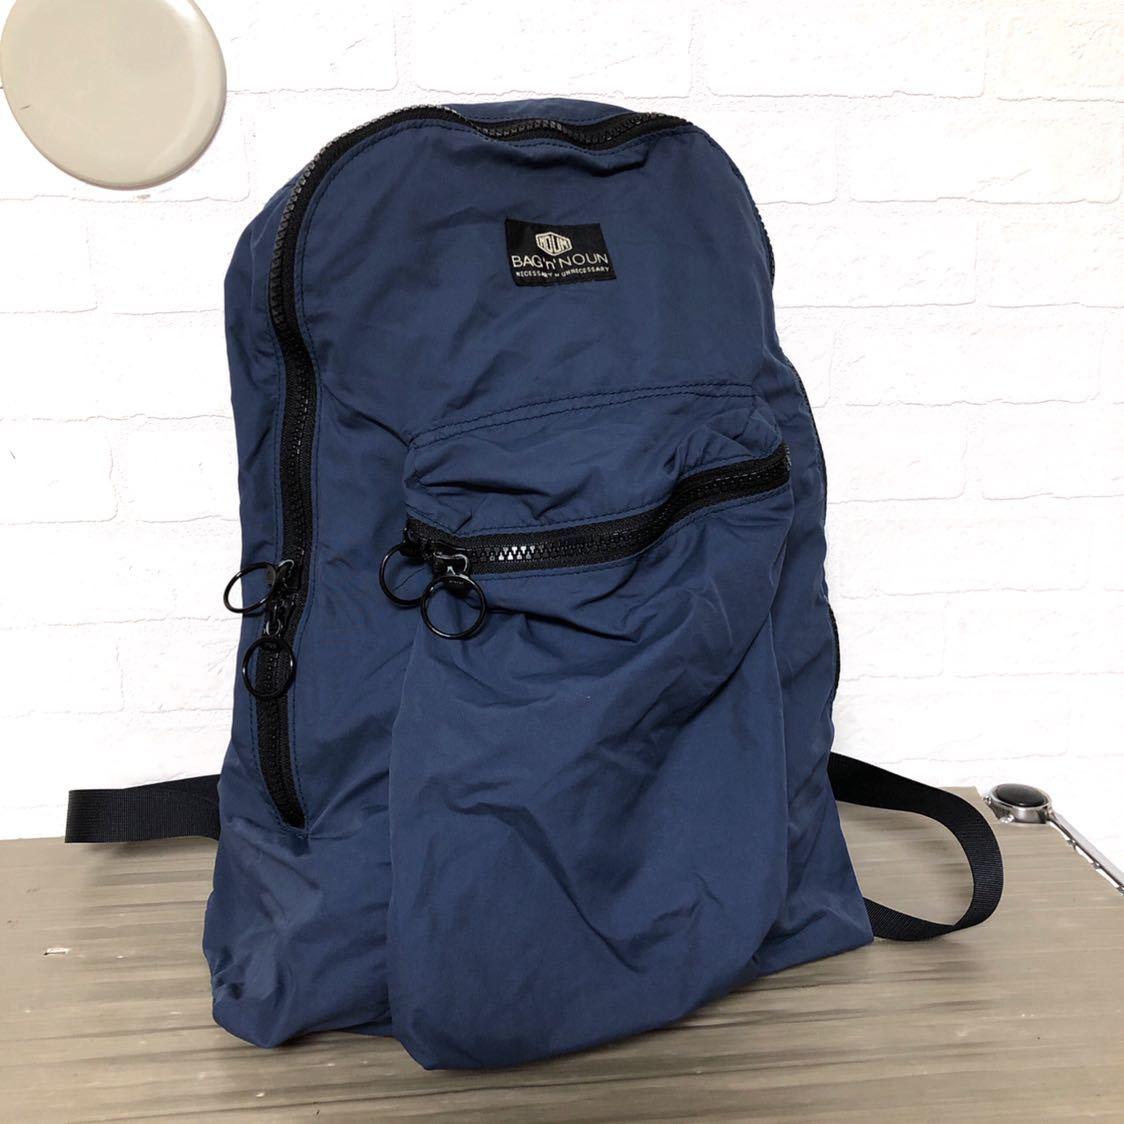 94b2588a1fe4 330☆ BAG'n'NOUN バッグンナウン リュック バックパック デイパック レディース 鞄 カバン ネイビー